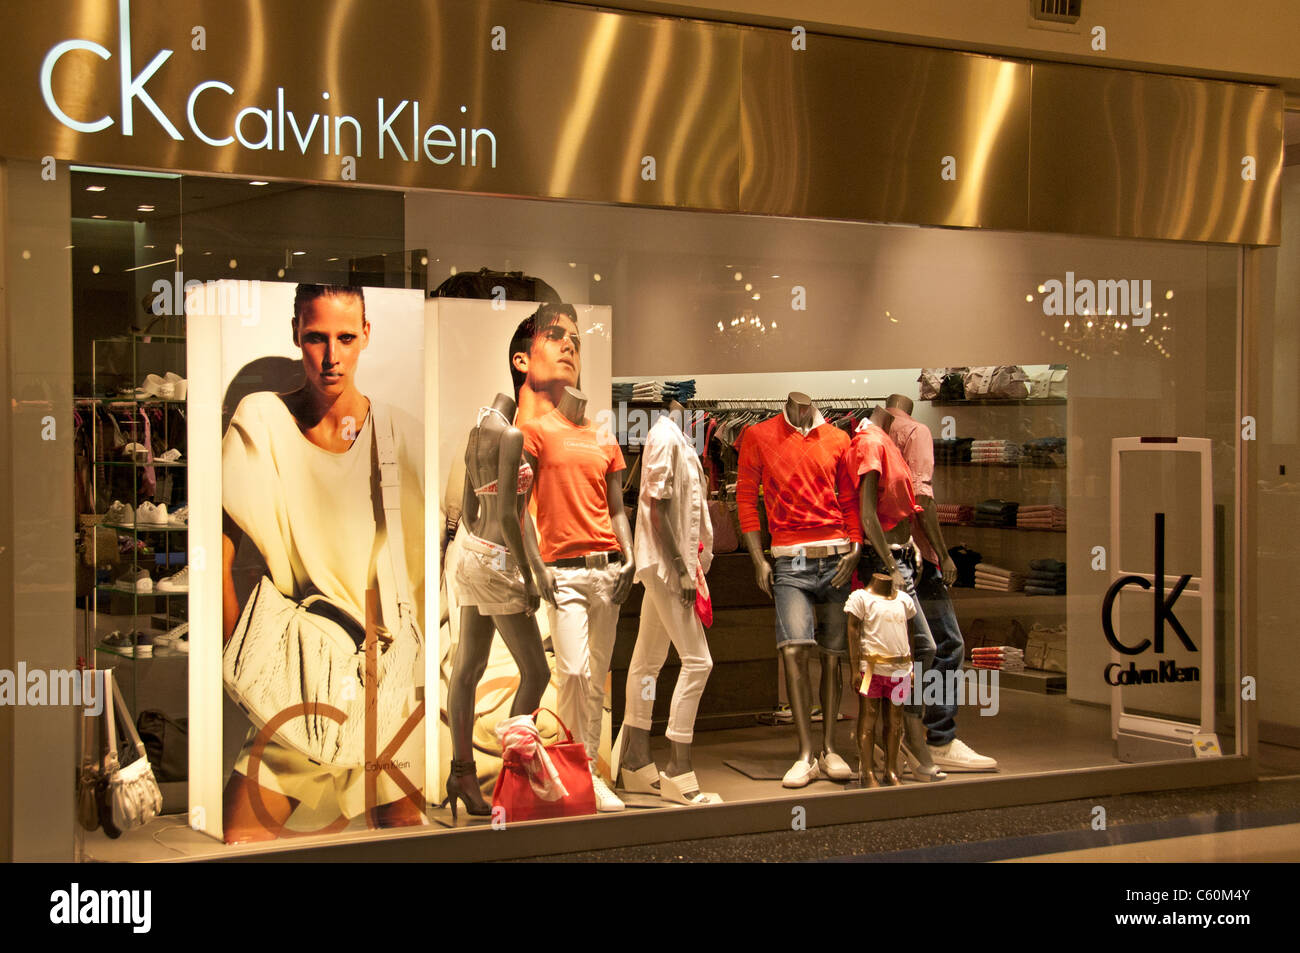 calvin klein istanbul istinye park shopping mall is a unique urban